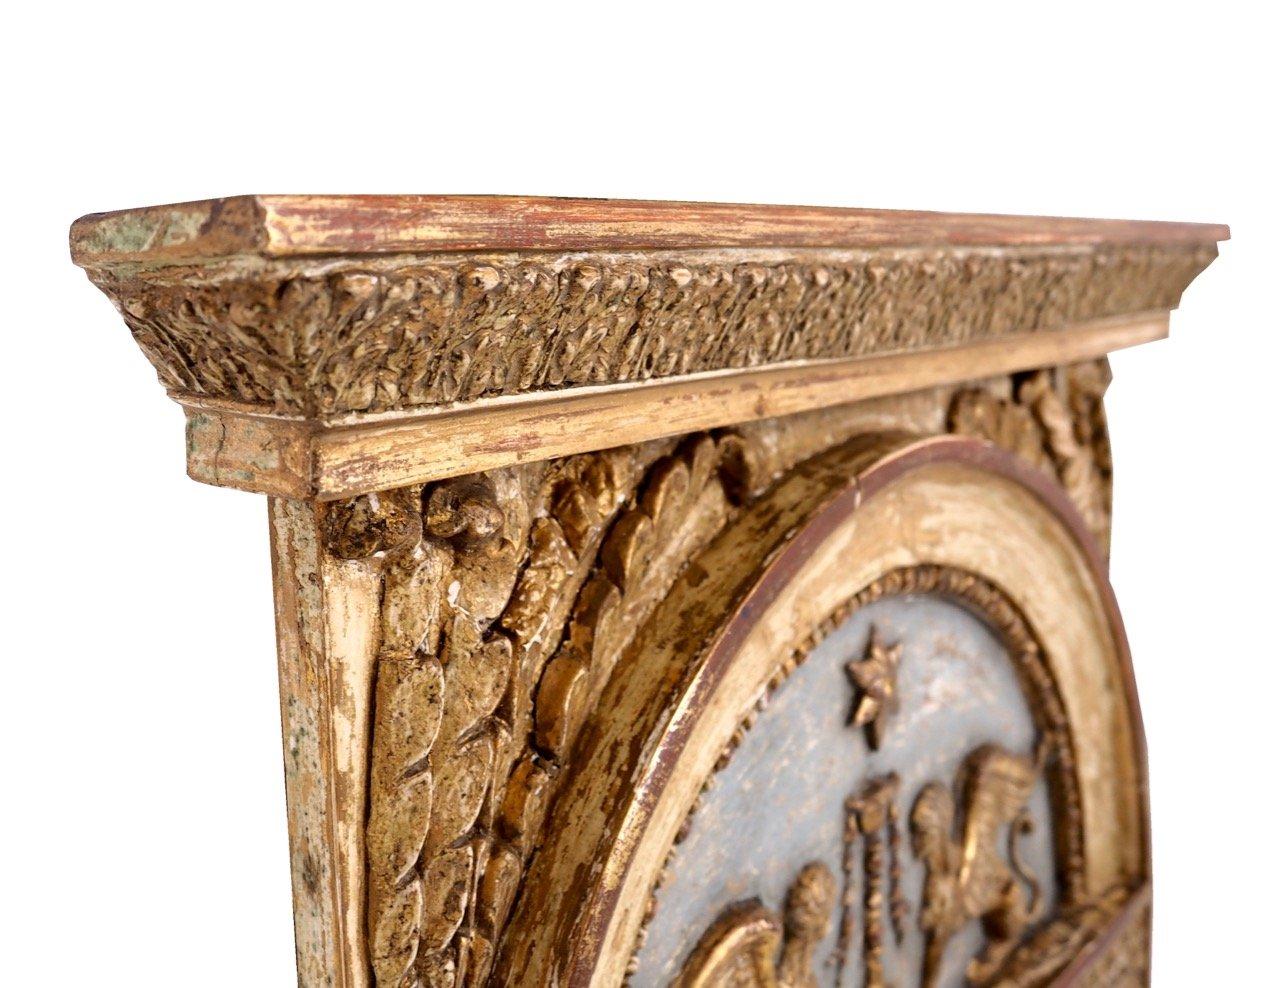 gro er antiker spiegel mit rahmen aus geschnitztem holz. Black Bedroom Furniture Sets. Home Design Ideas